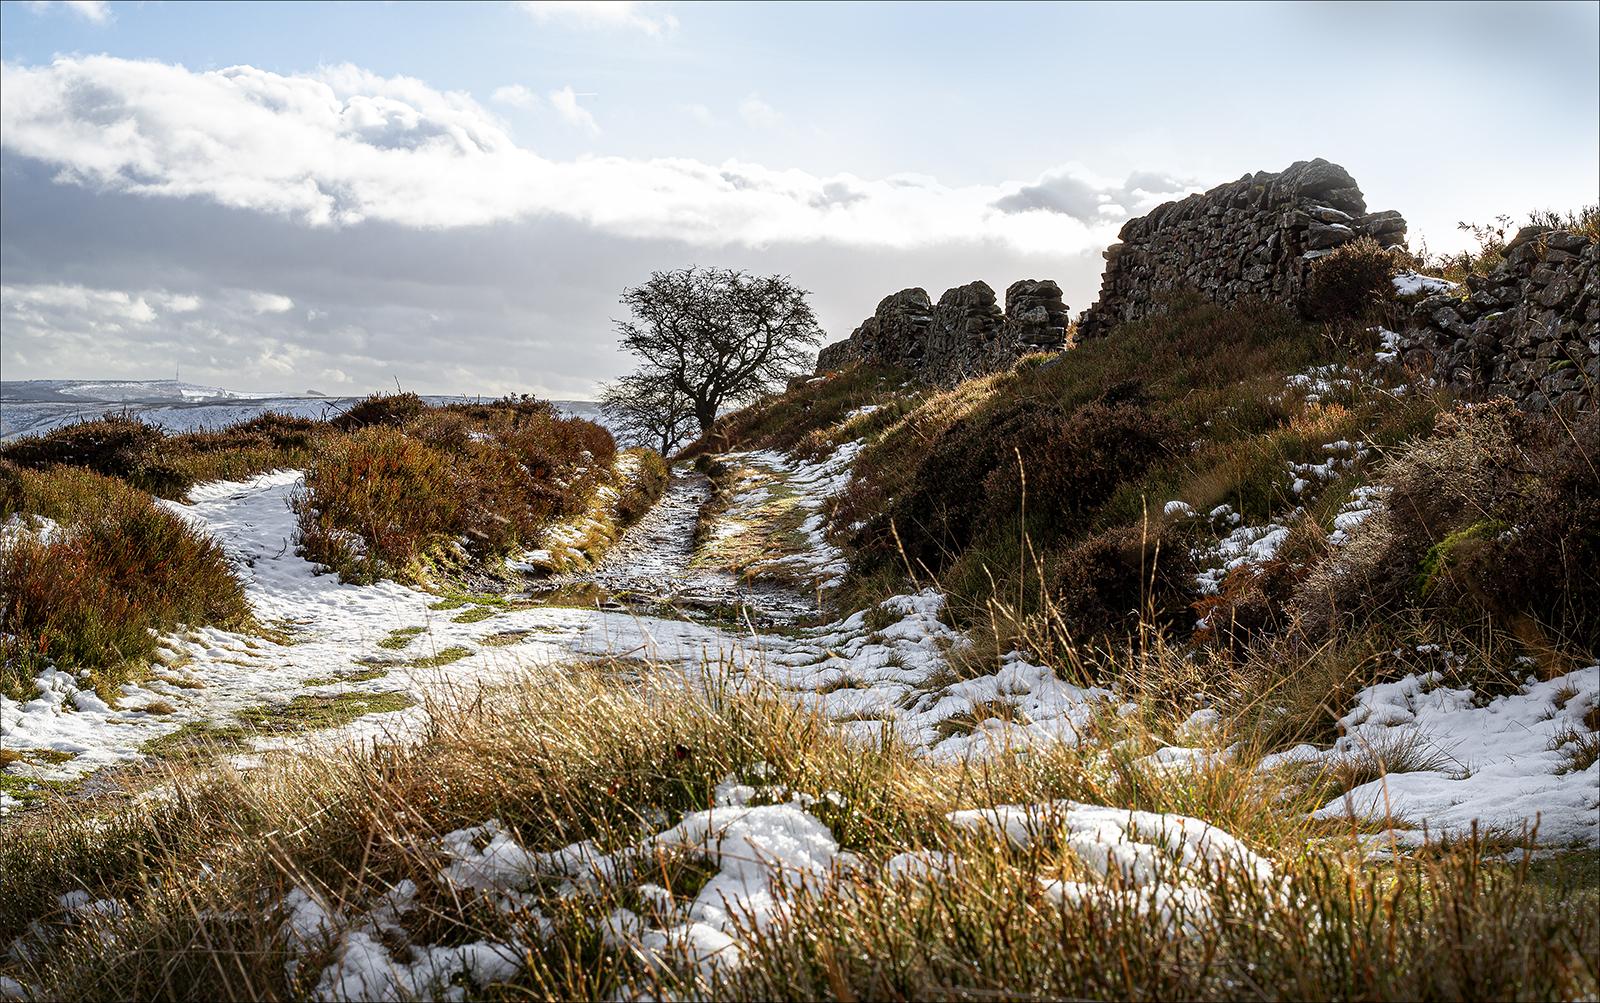 Winter on Whin Hill, Derbyshire